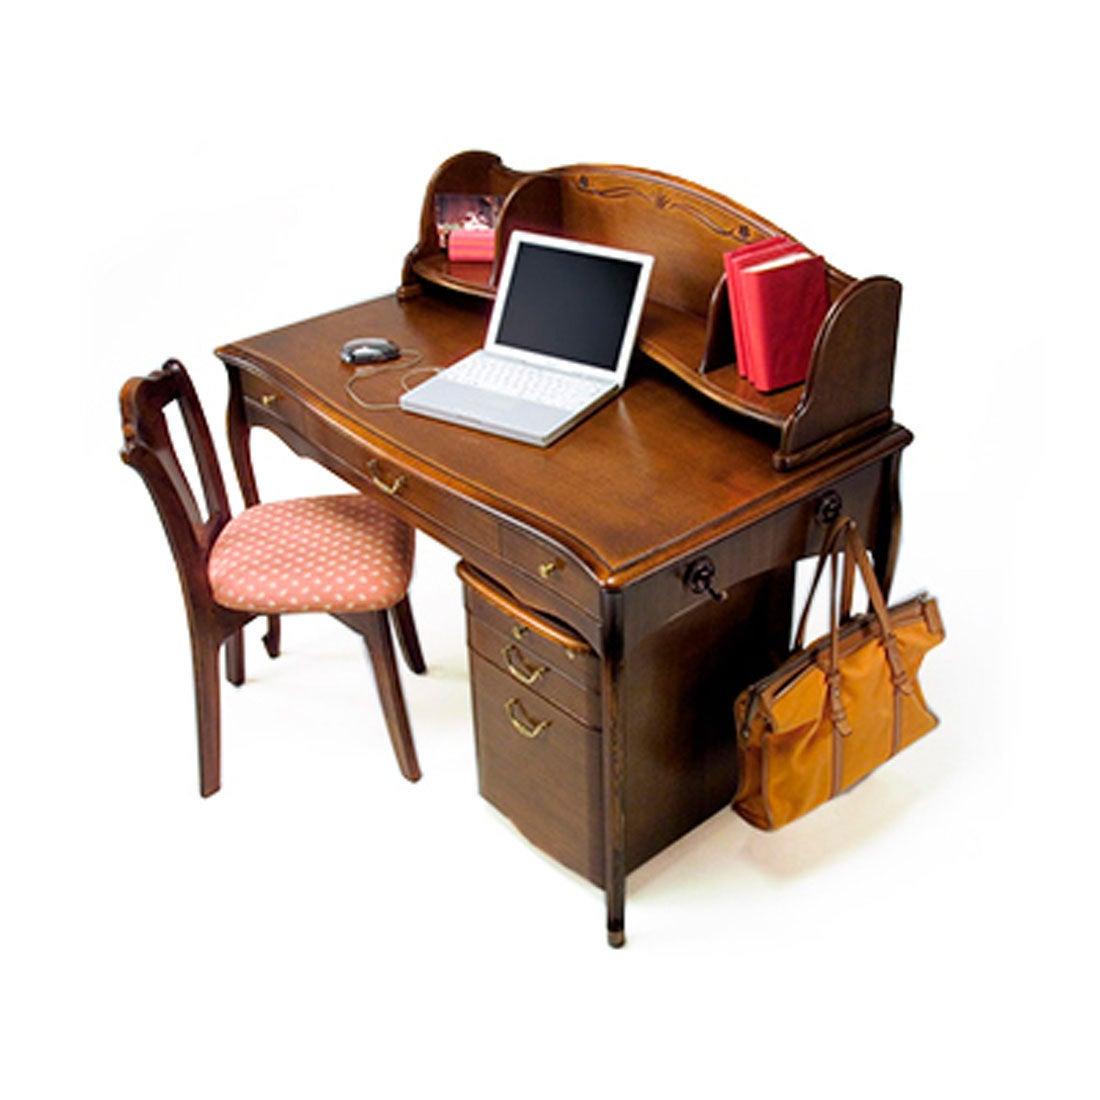 IDC OTSUKA/大塚家具 学習机セット カンティーニュ デスク、上置、ワゴン付 アンティーク色 (アンティーク)